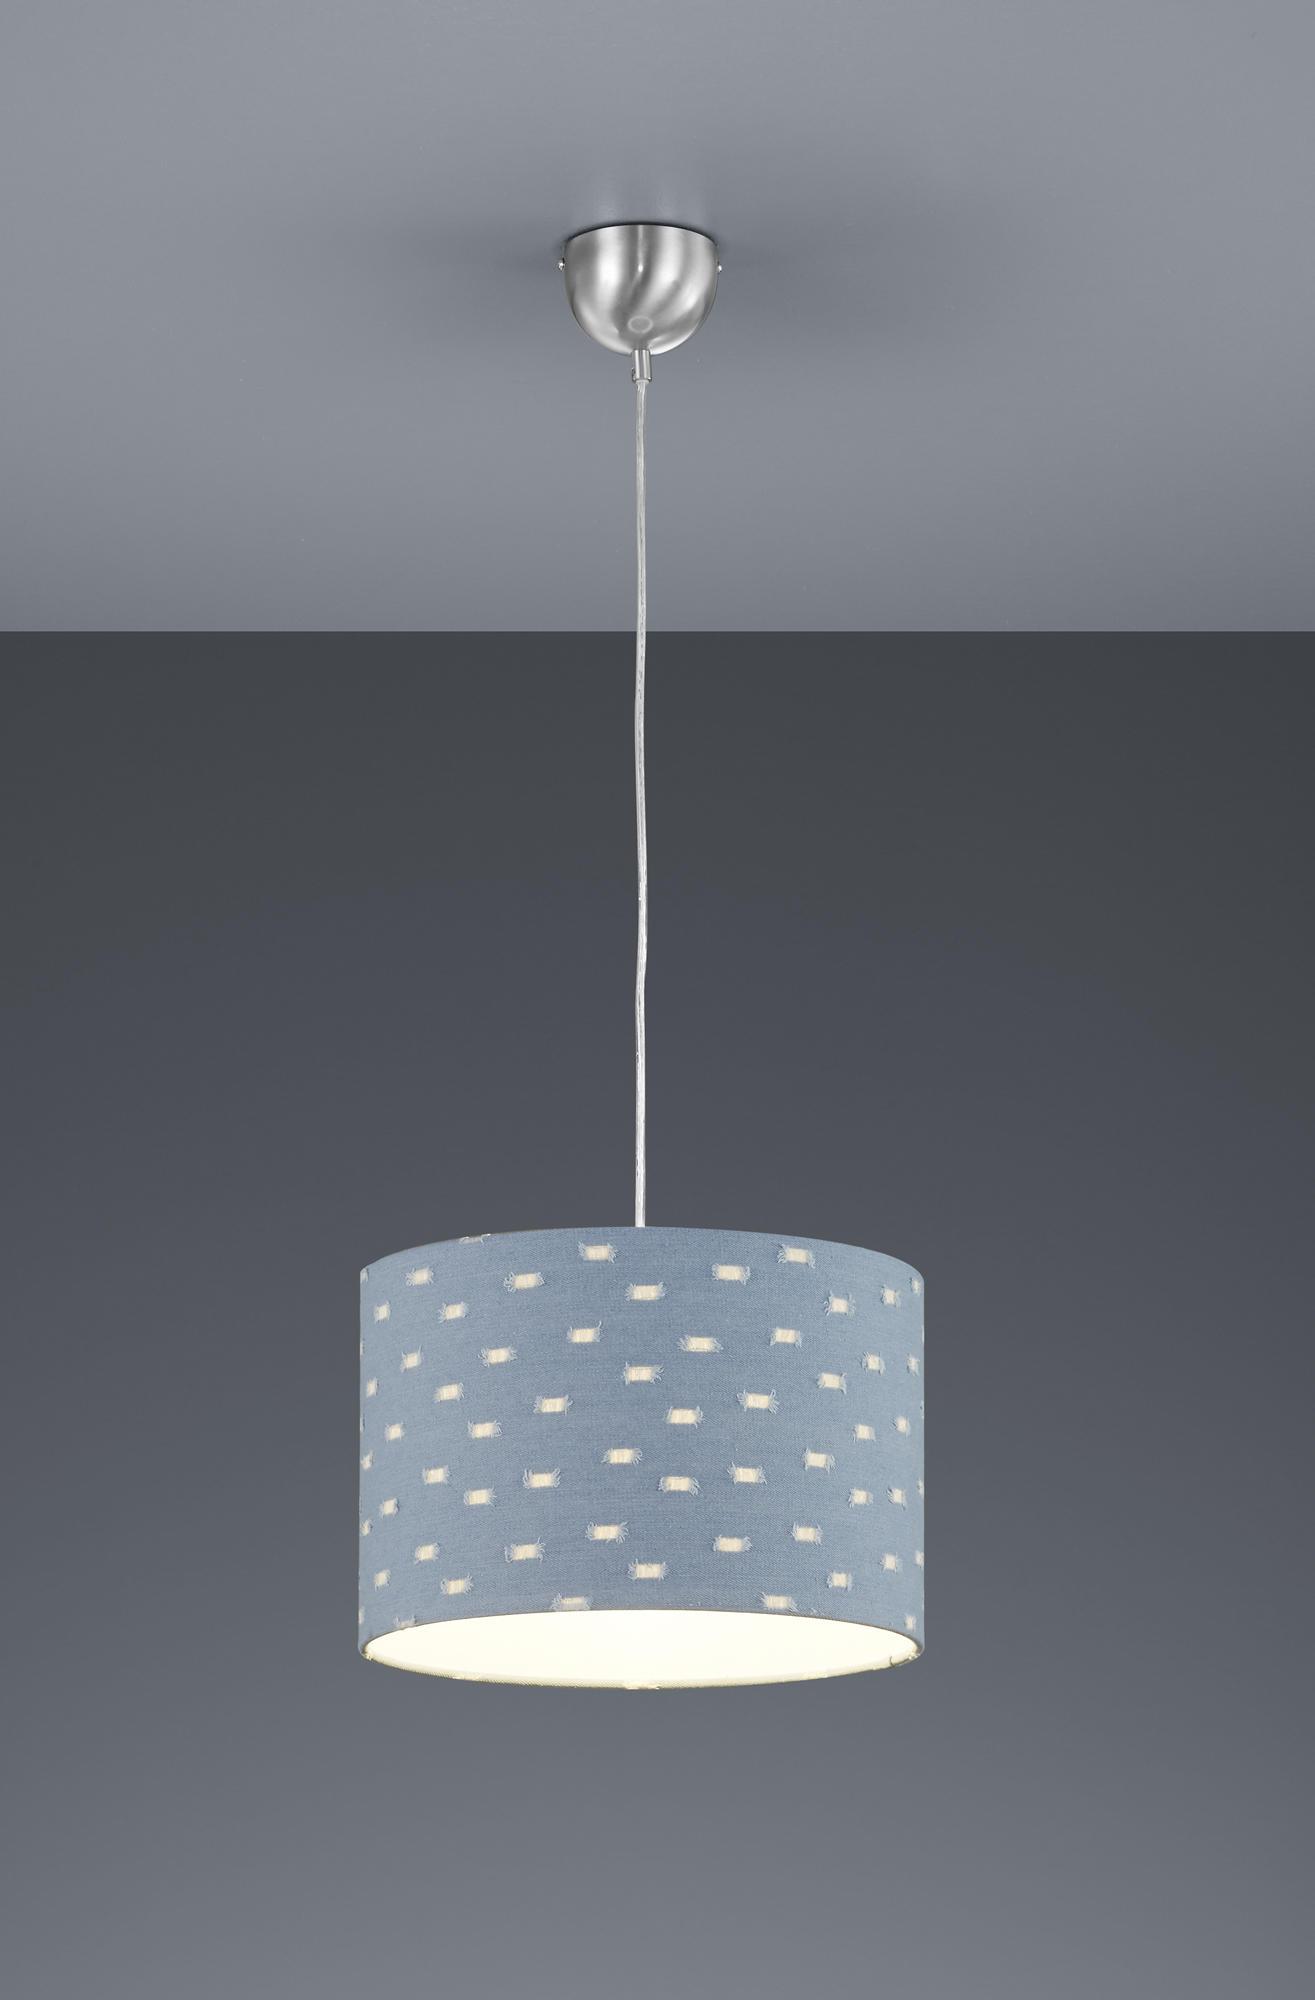 LED Lampe Kinderzimmer RAINBOW RABBIT Sternenhimmel ...